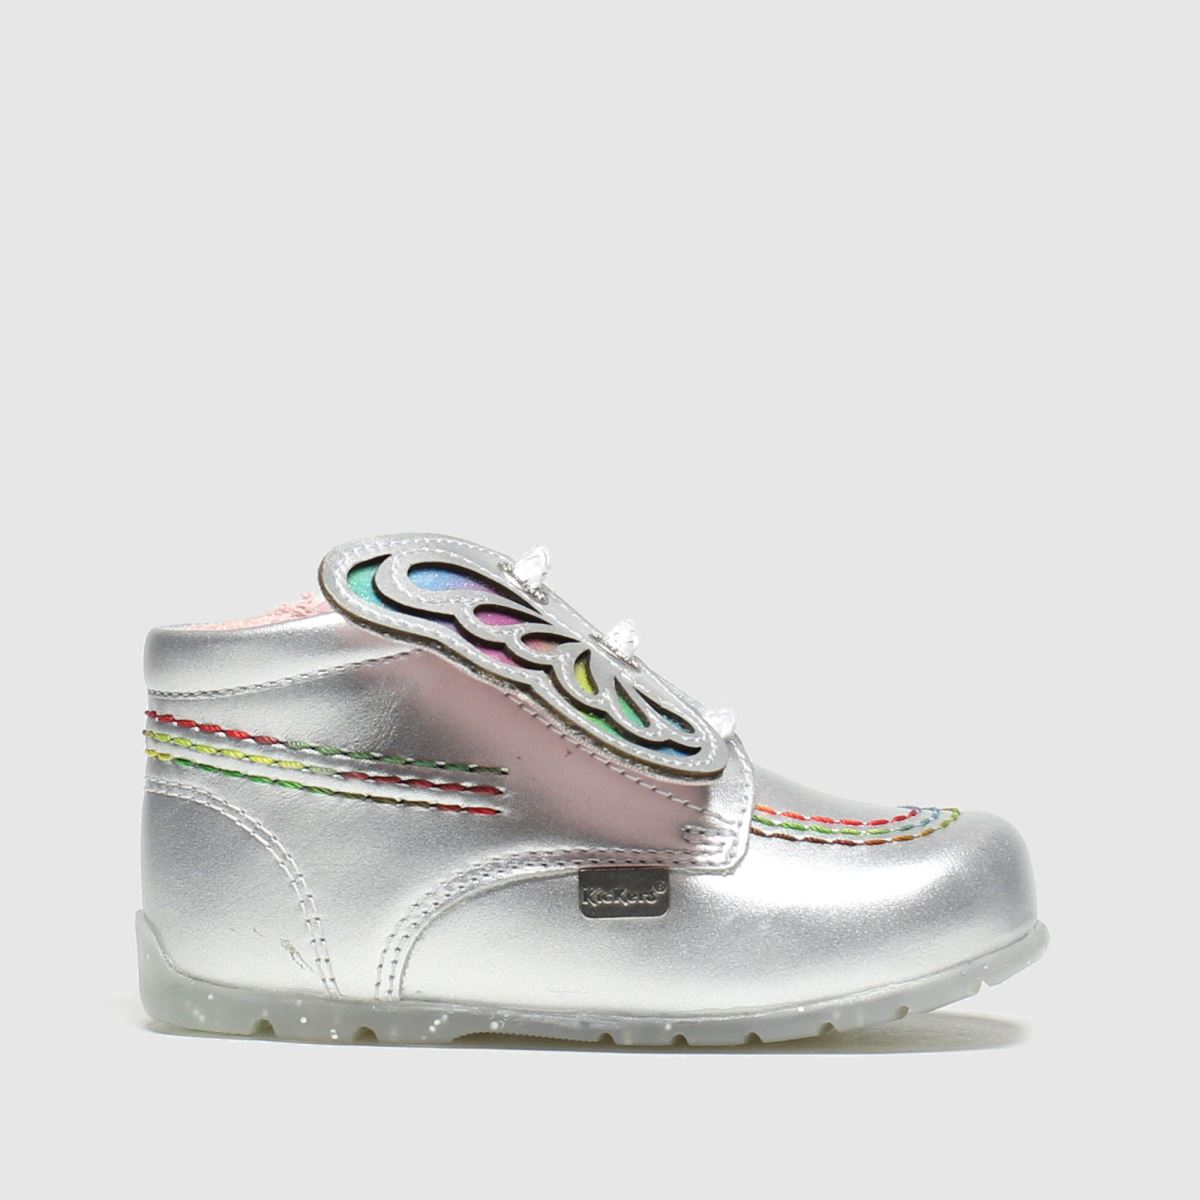 Kickers Silver Kick Faeries Mini Crib Shoes Baby